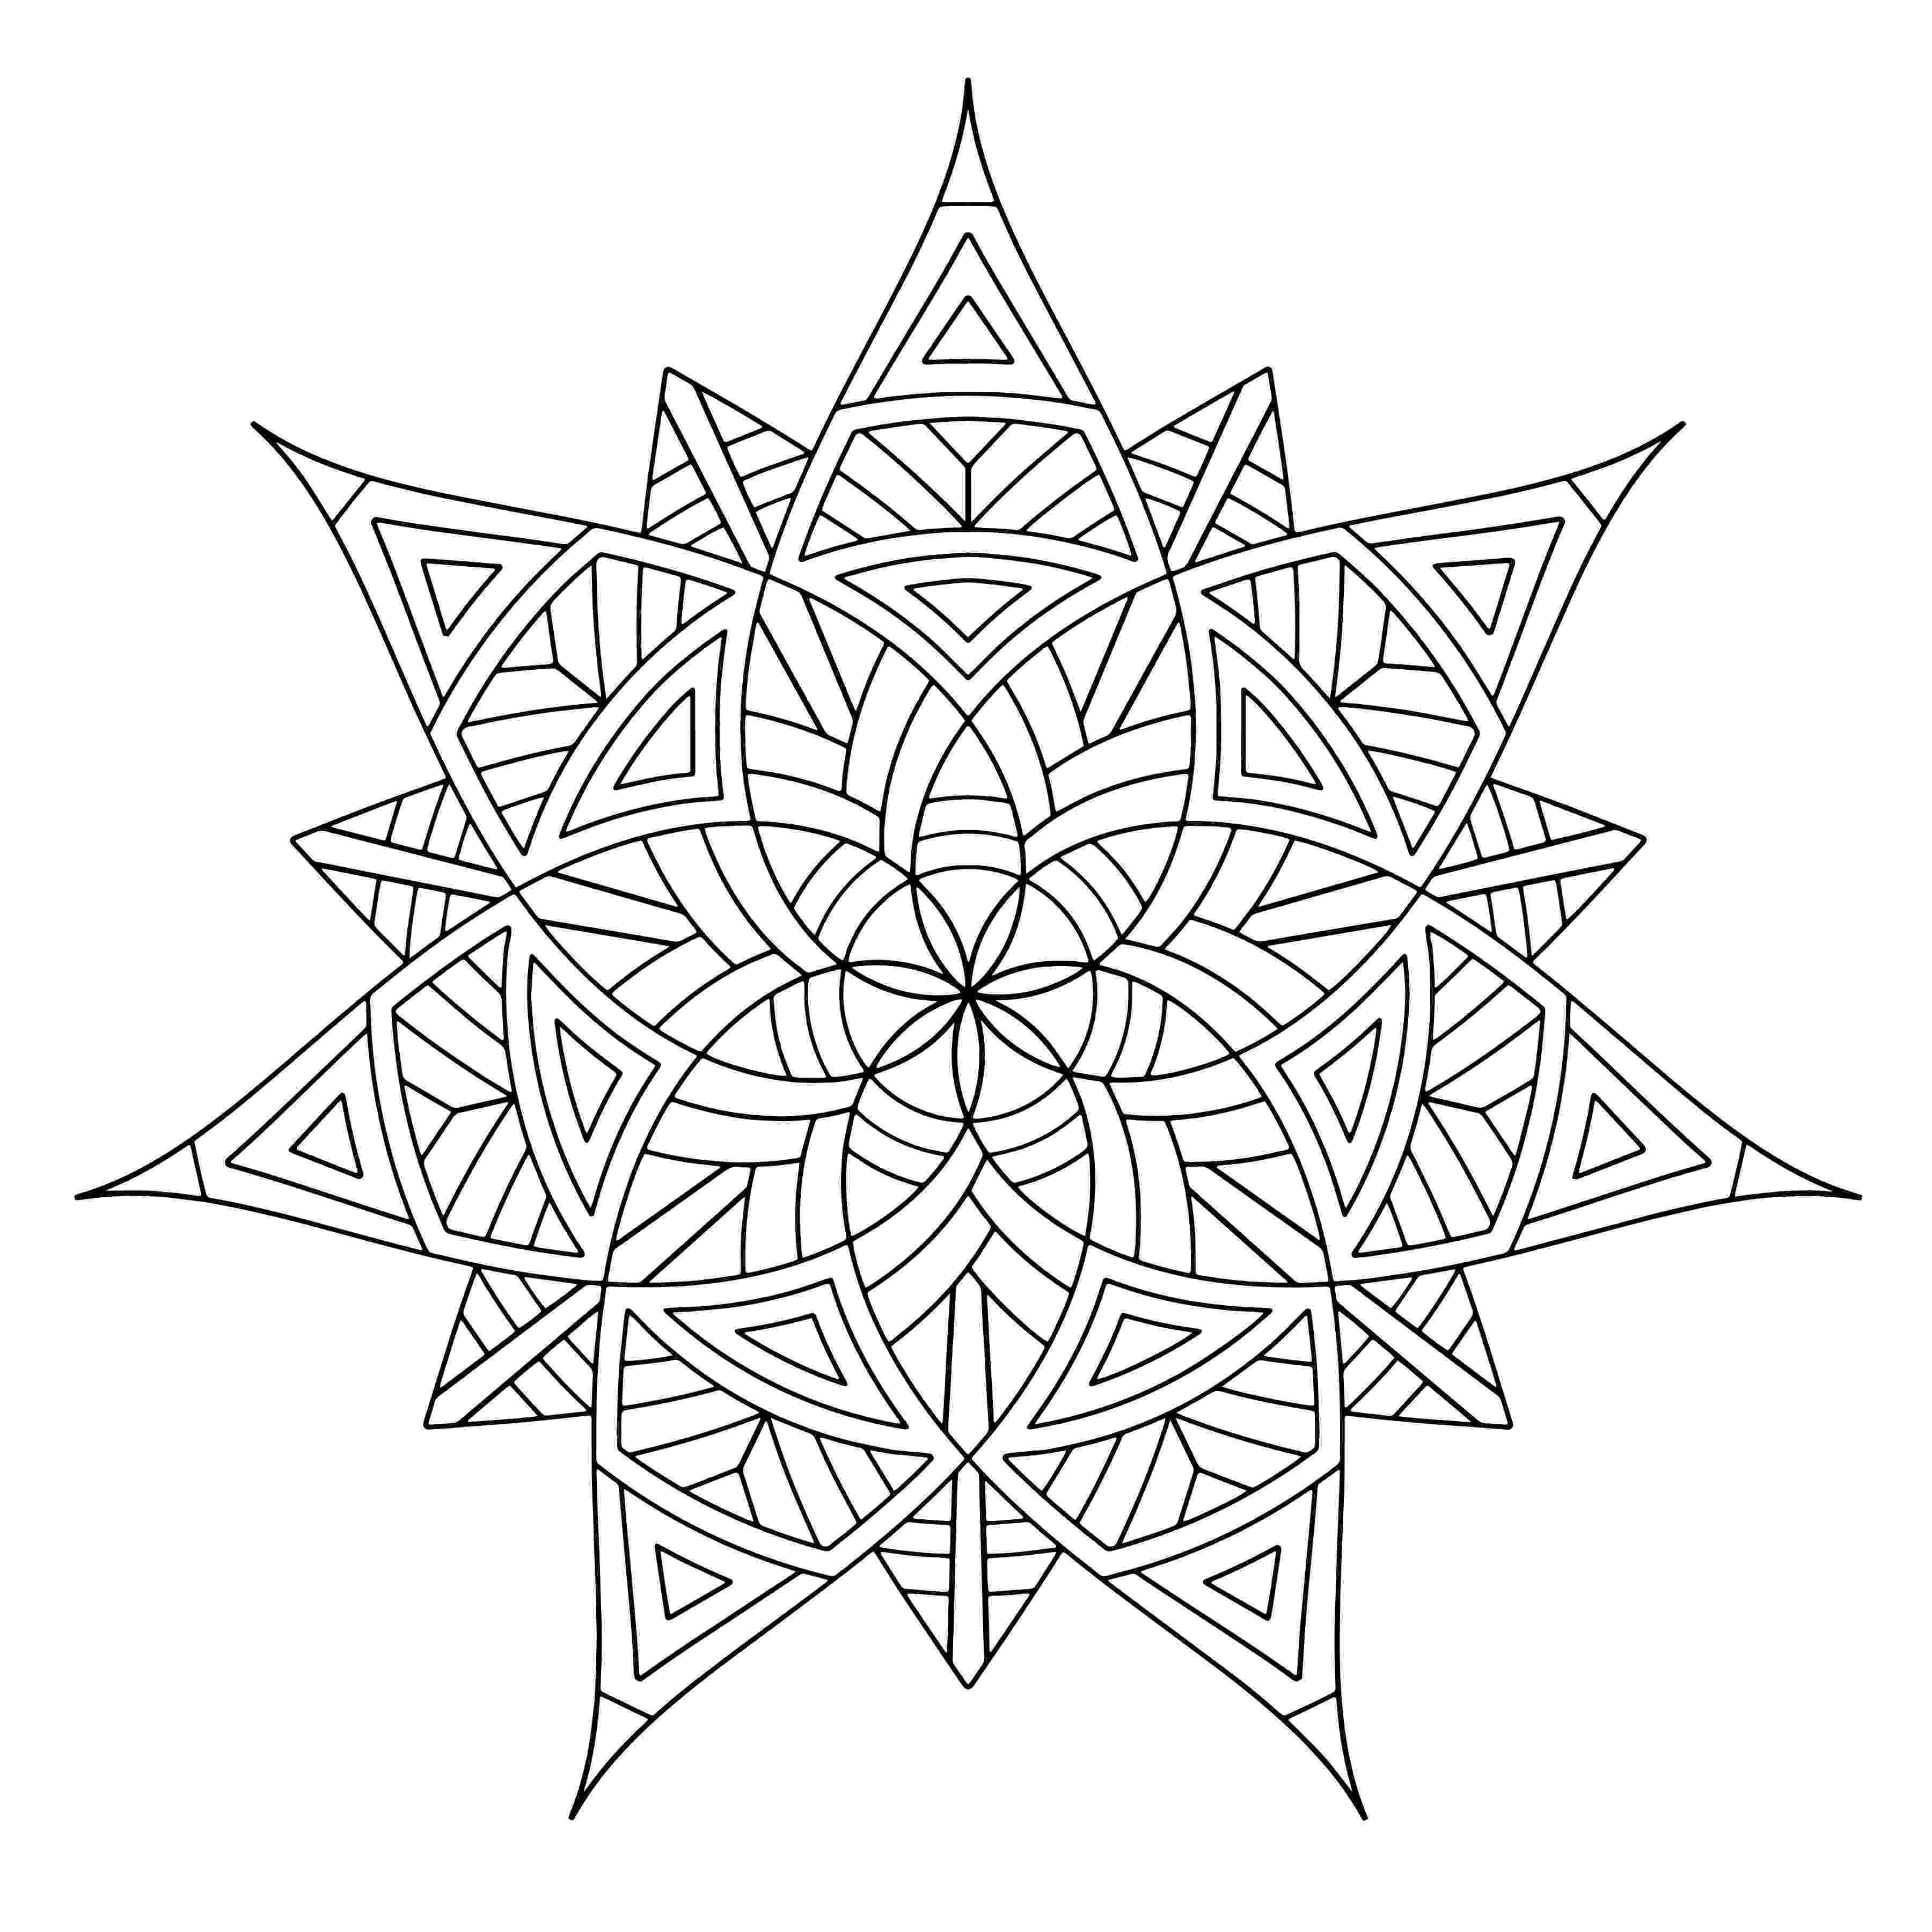 colouring patterns free printable geometric coloring pages for adults colouring patterns 1 1